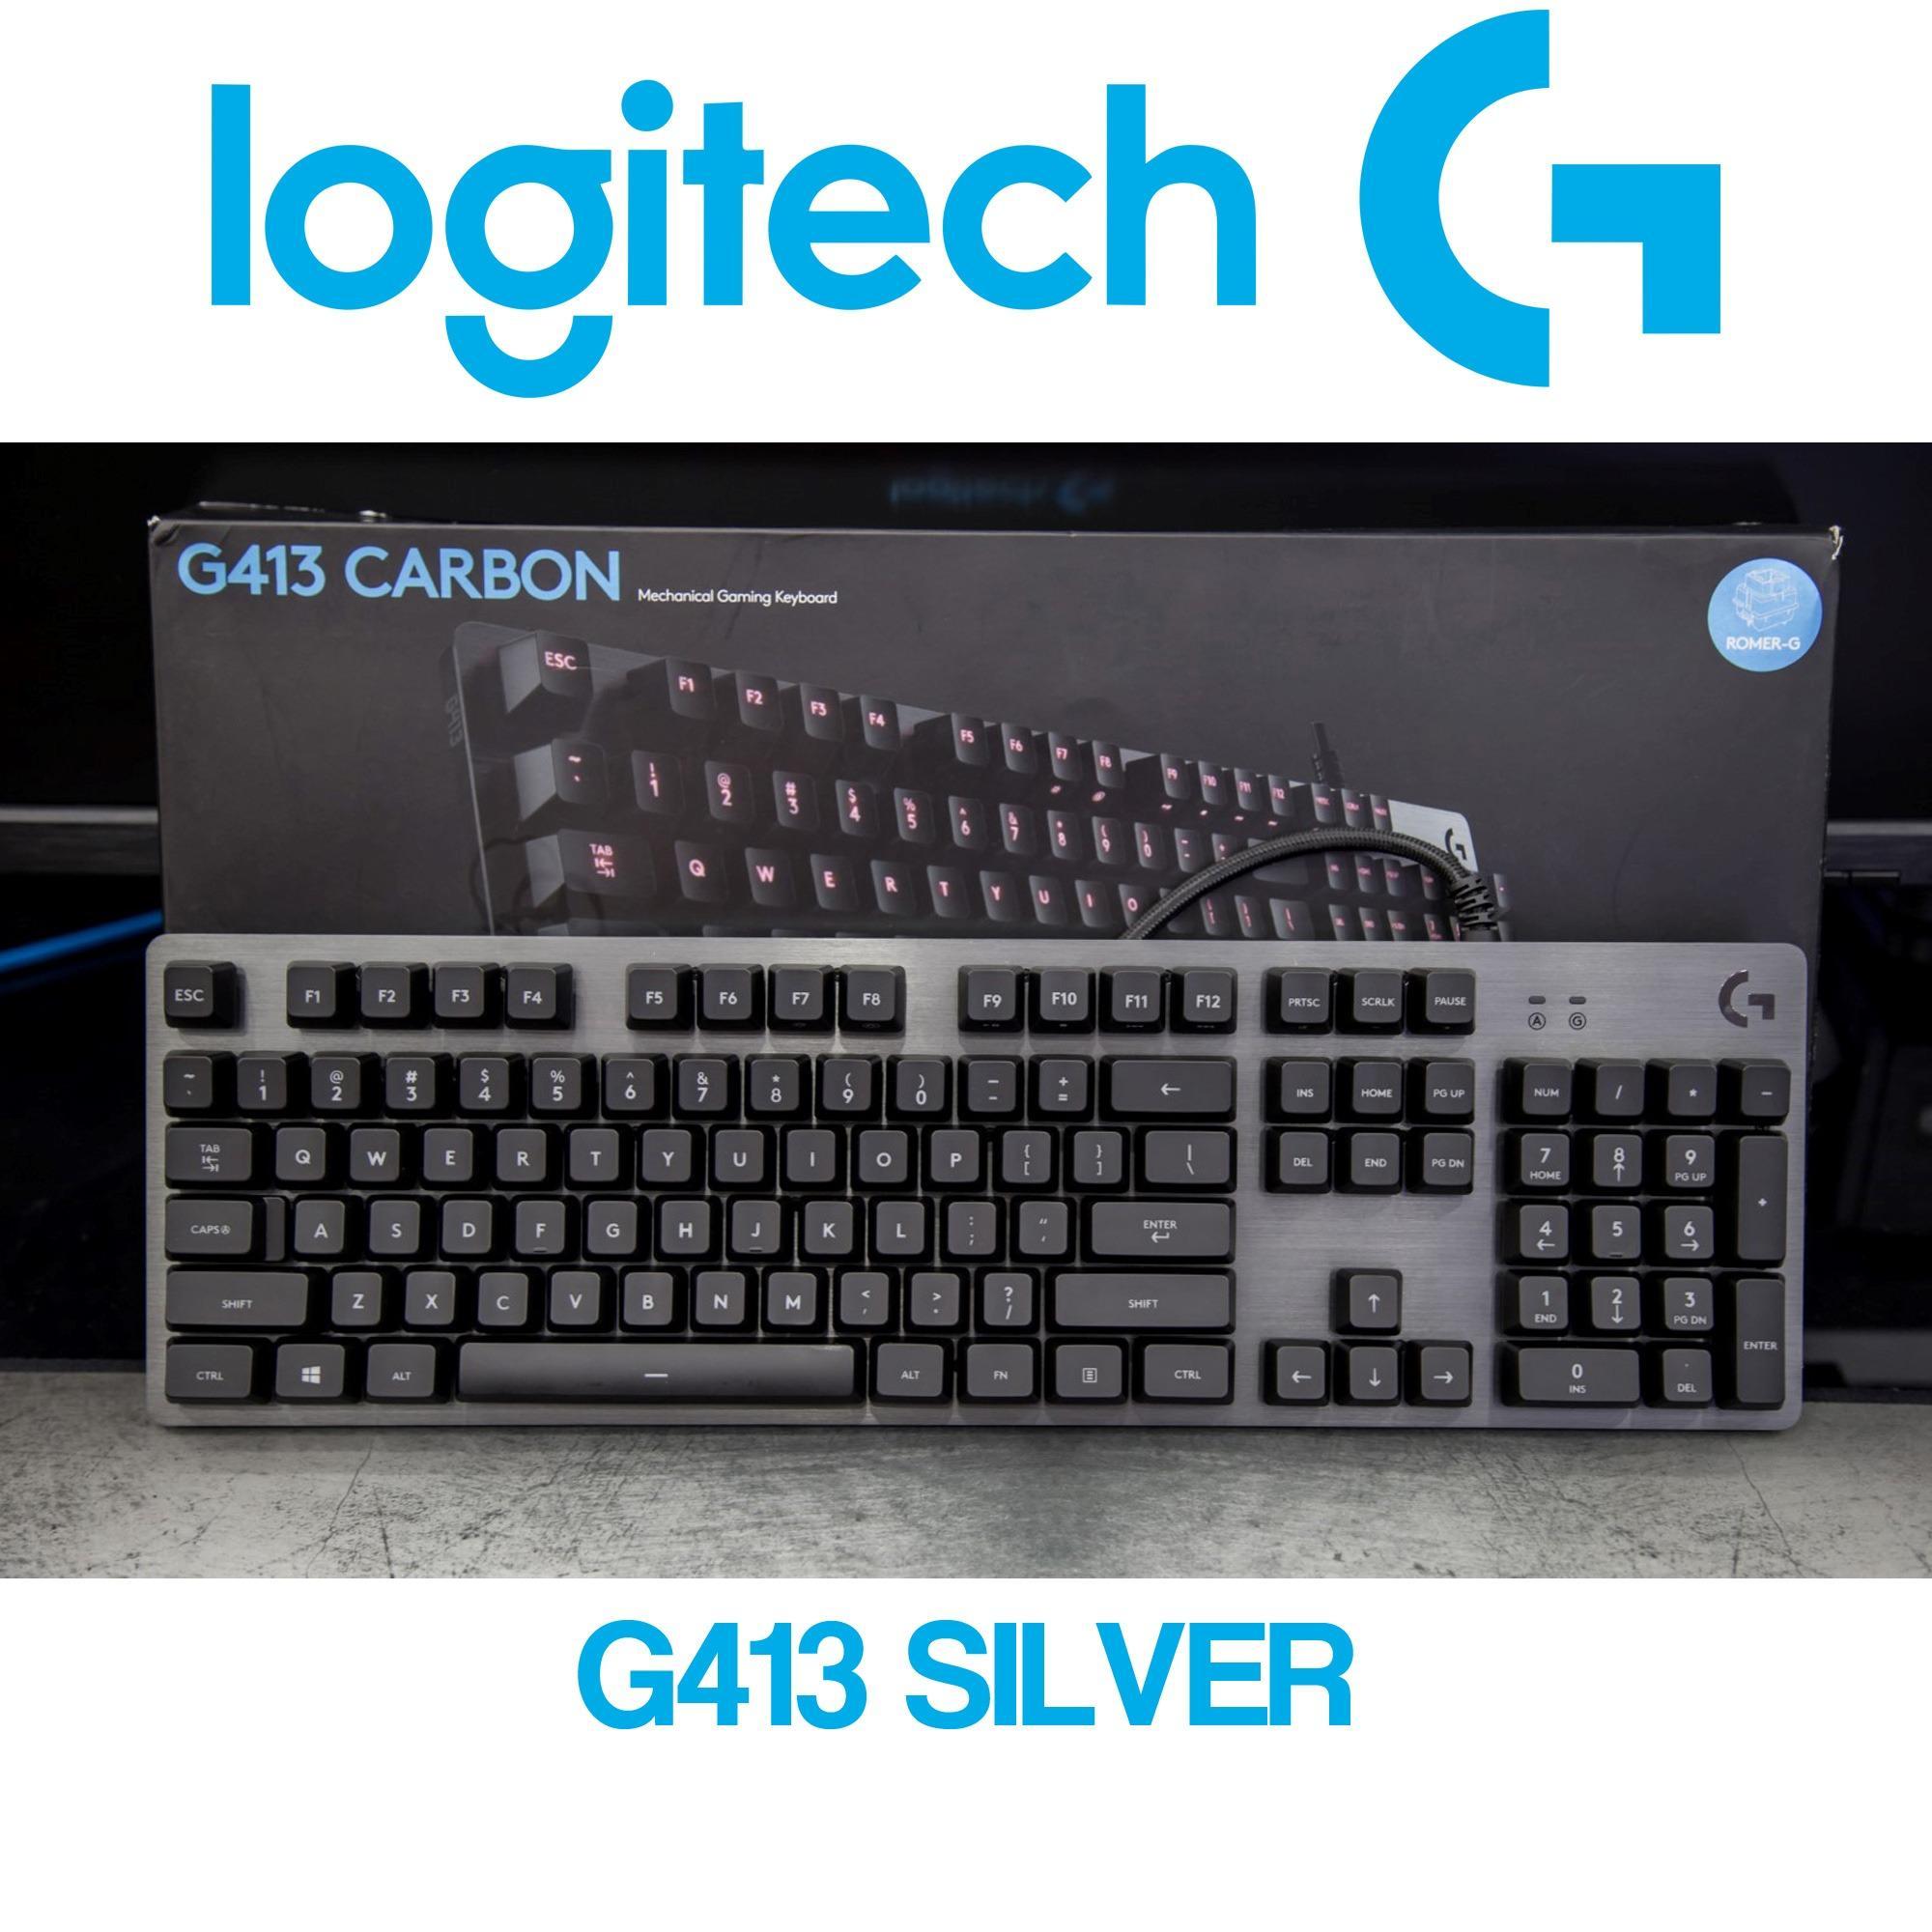 Logitech G413 SIlver Mechanical Gaming Keyboard